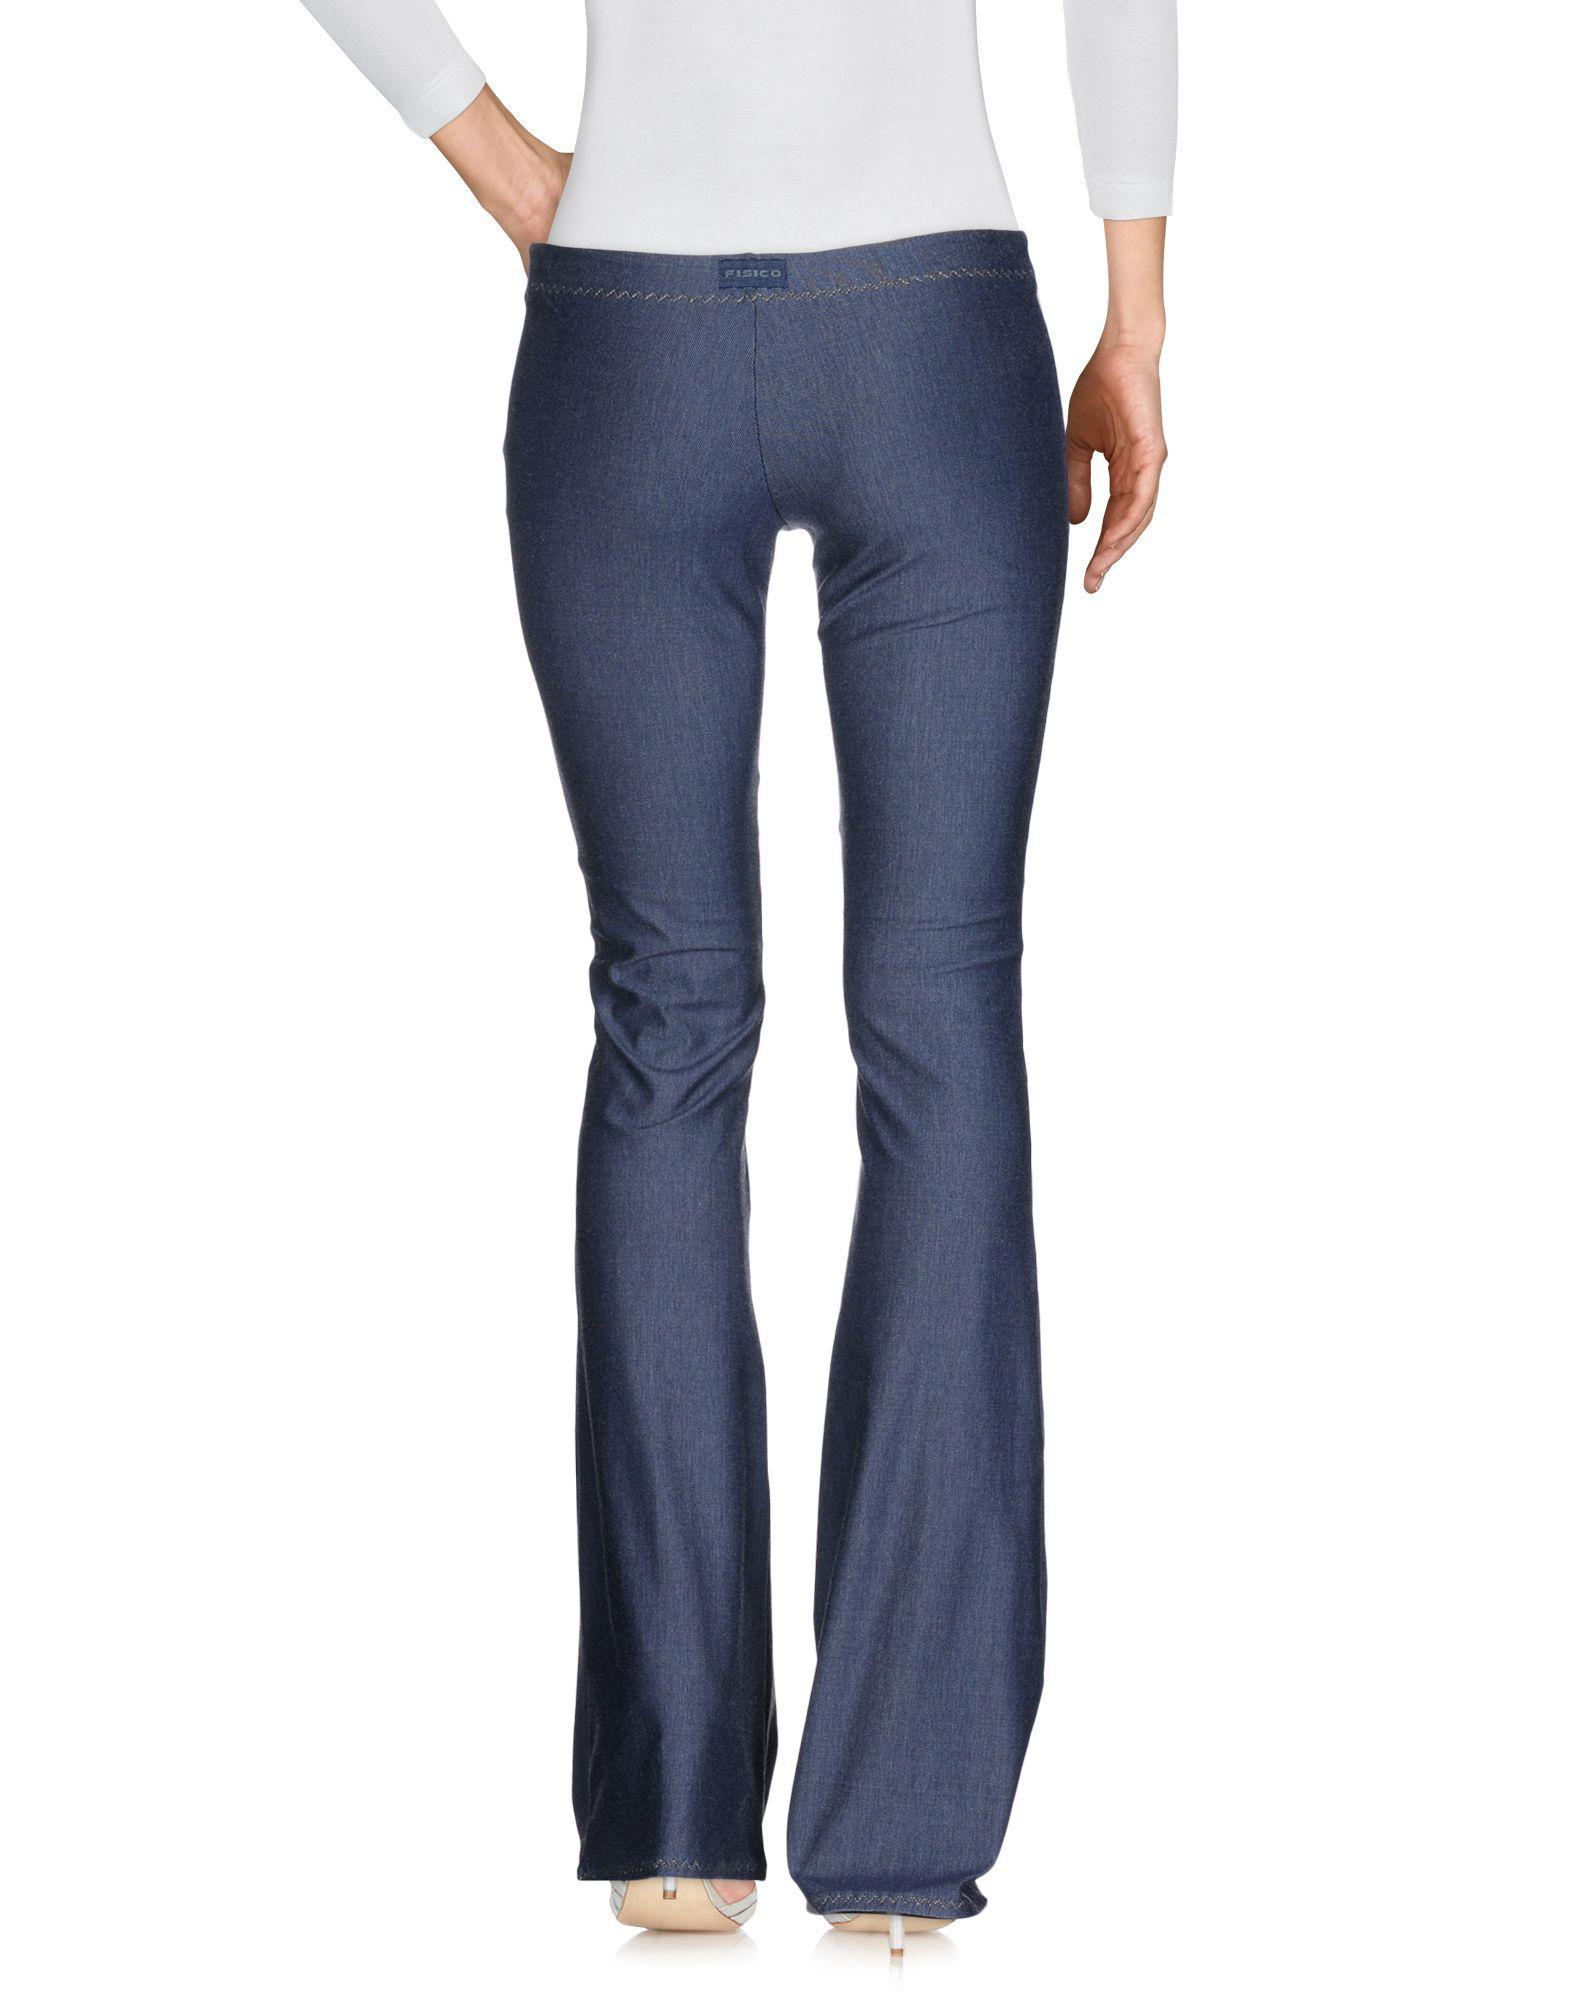 DENIM - Denim trousers Fisico 0BS8lD9Ow5